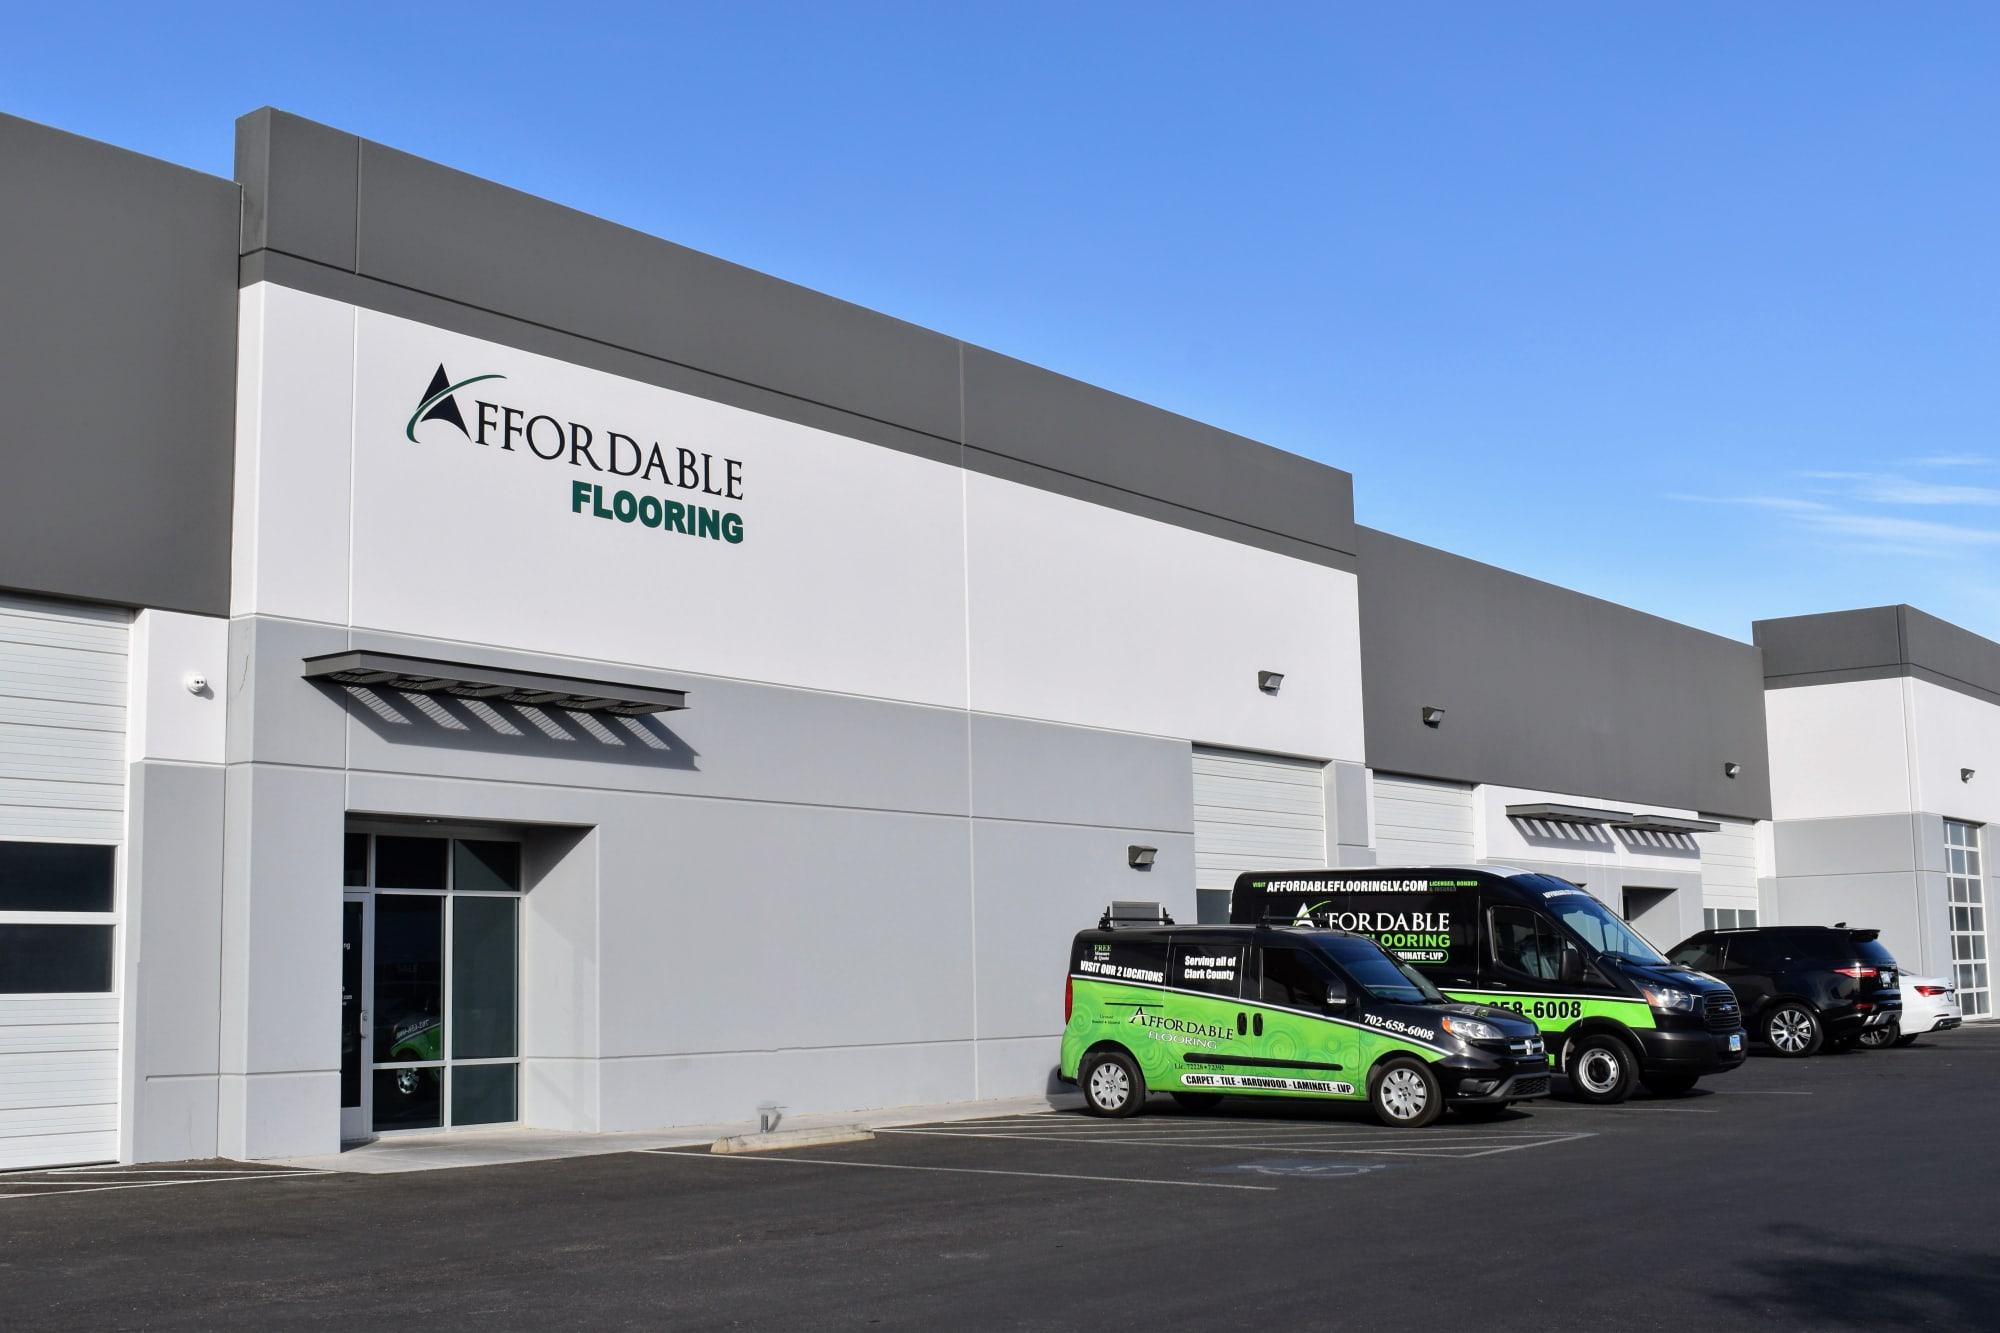 Affordable Flooring & More - 7165 S Buffalo Dr UNIT 115 Las Vegas, NV 89113